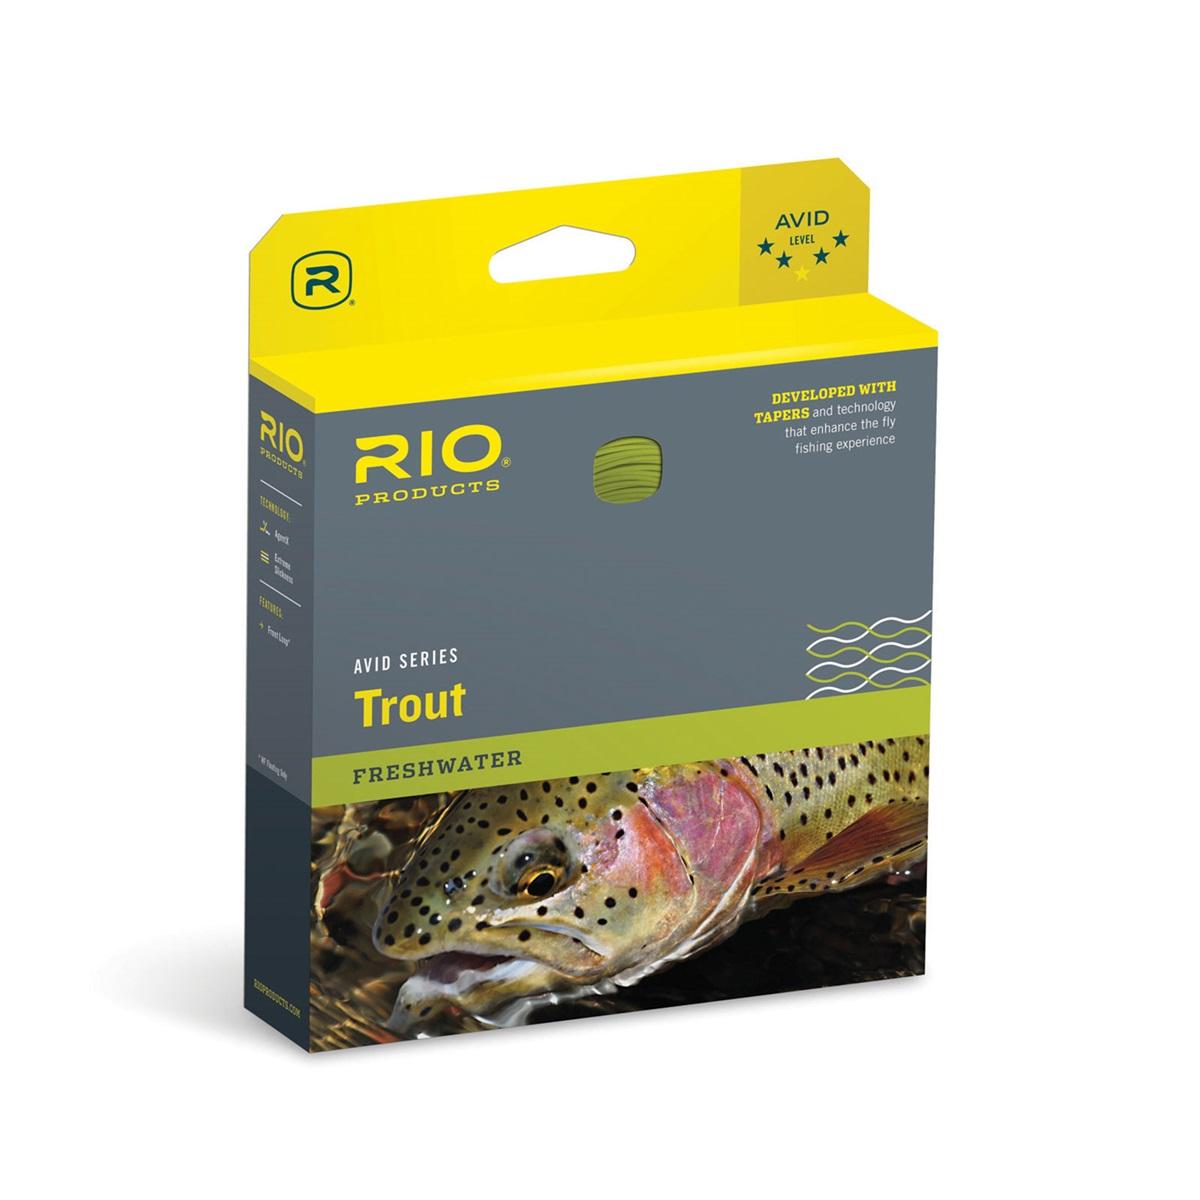 Rio avid trout wf5f01